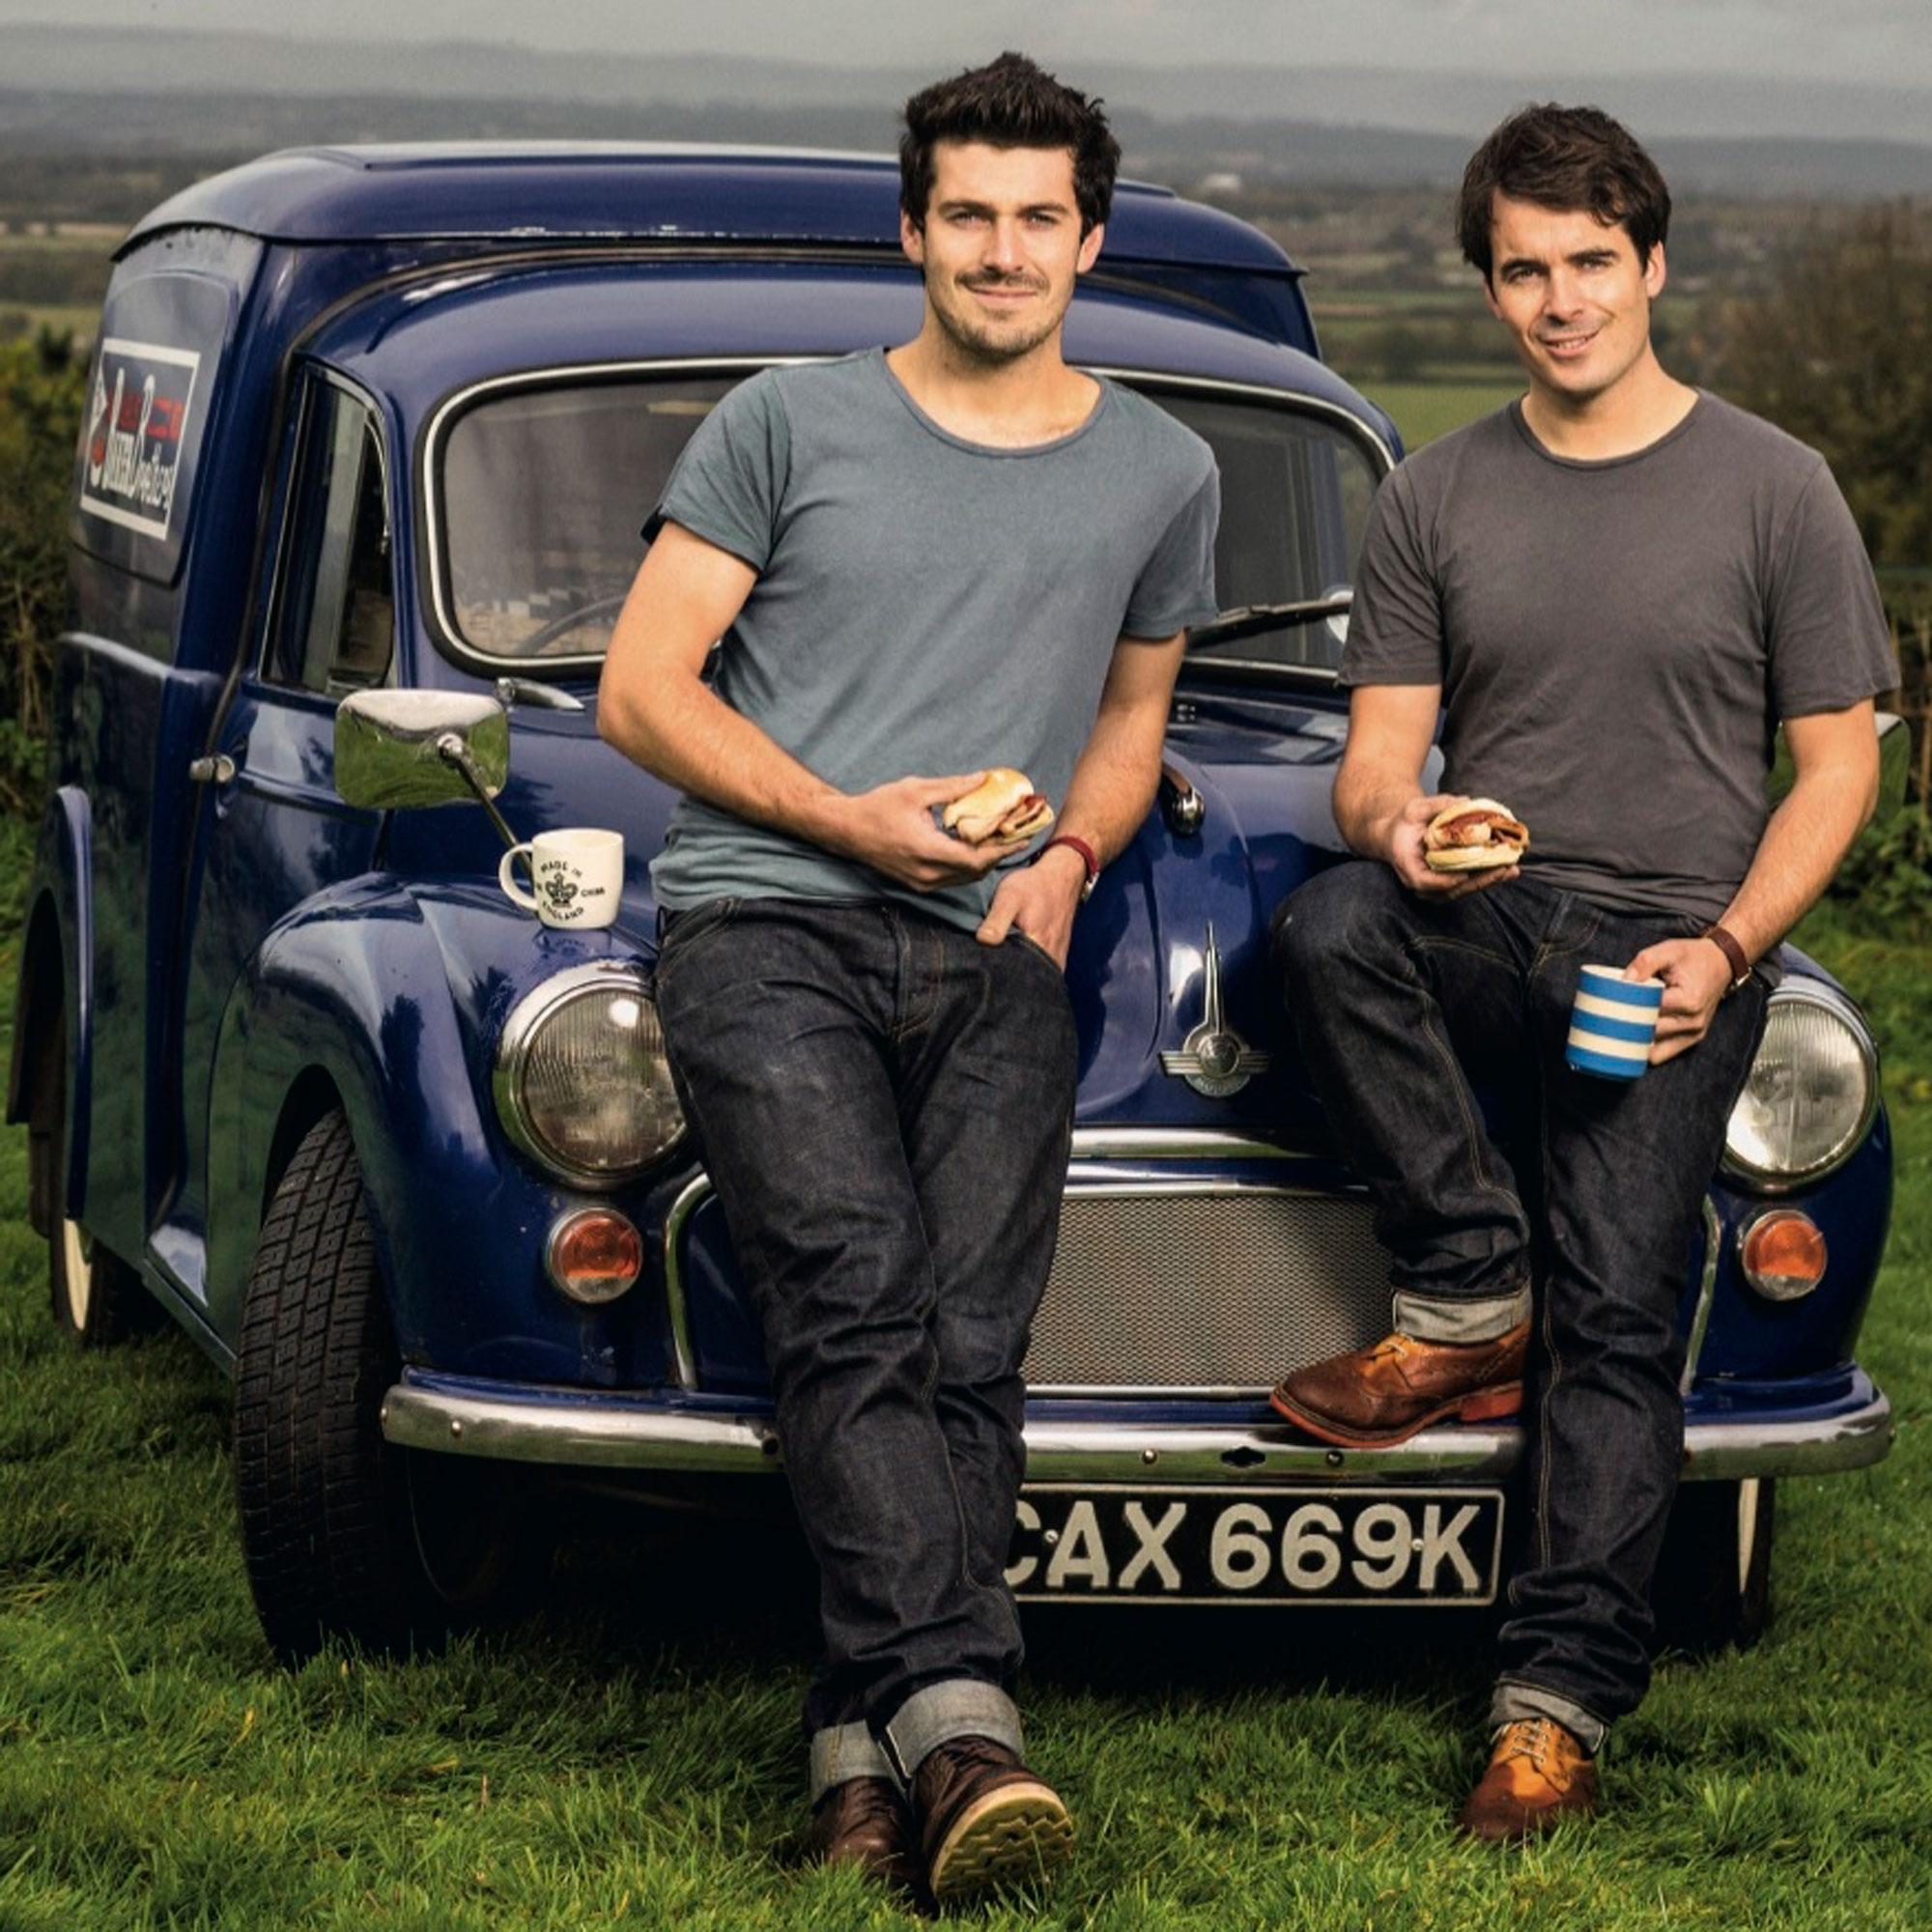 Fabulous Baker Brothers photo